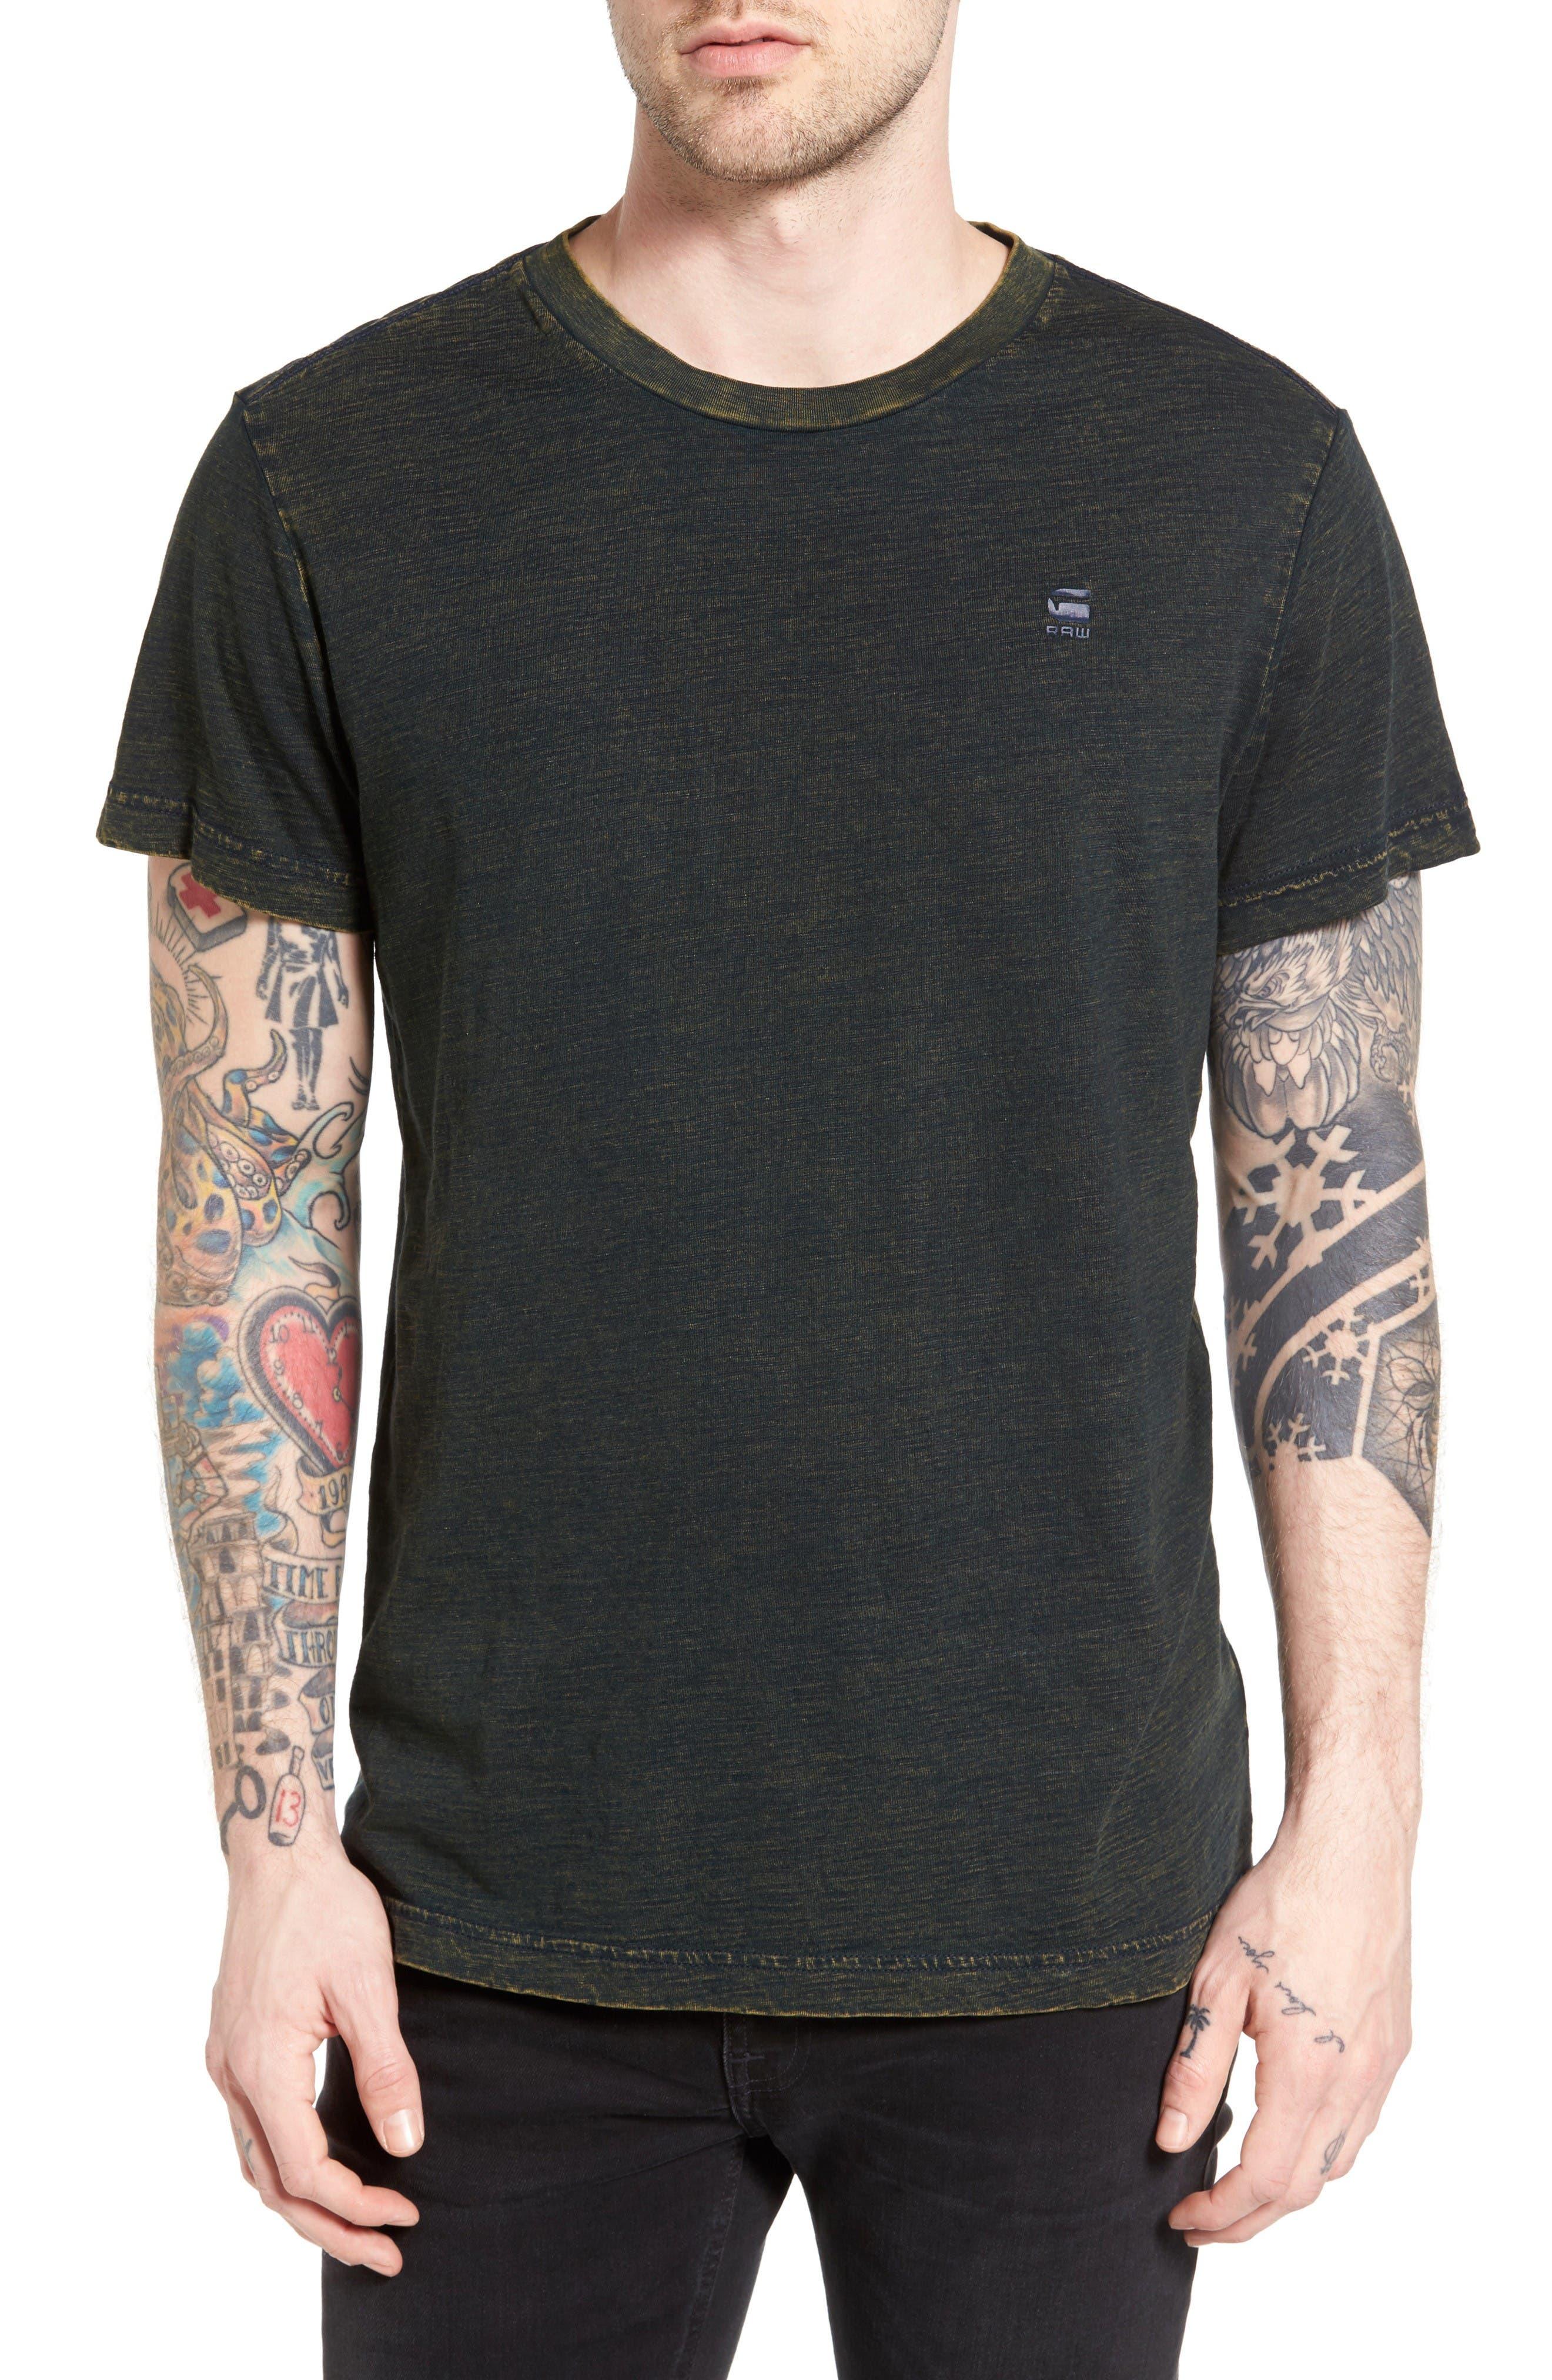 Alternate Image 1 Selected - G-Star Raw Wynzar Lyrood T-Shirt